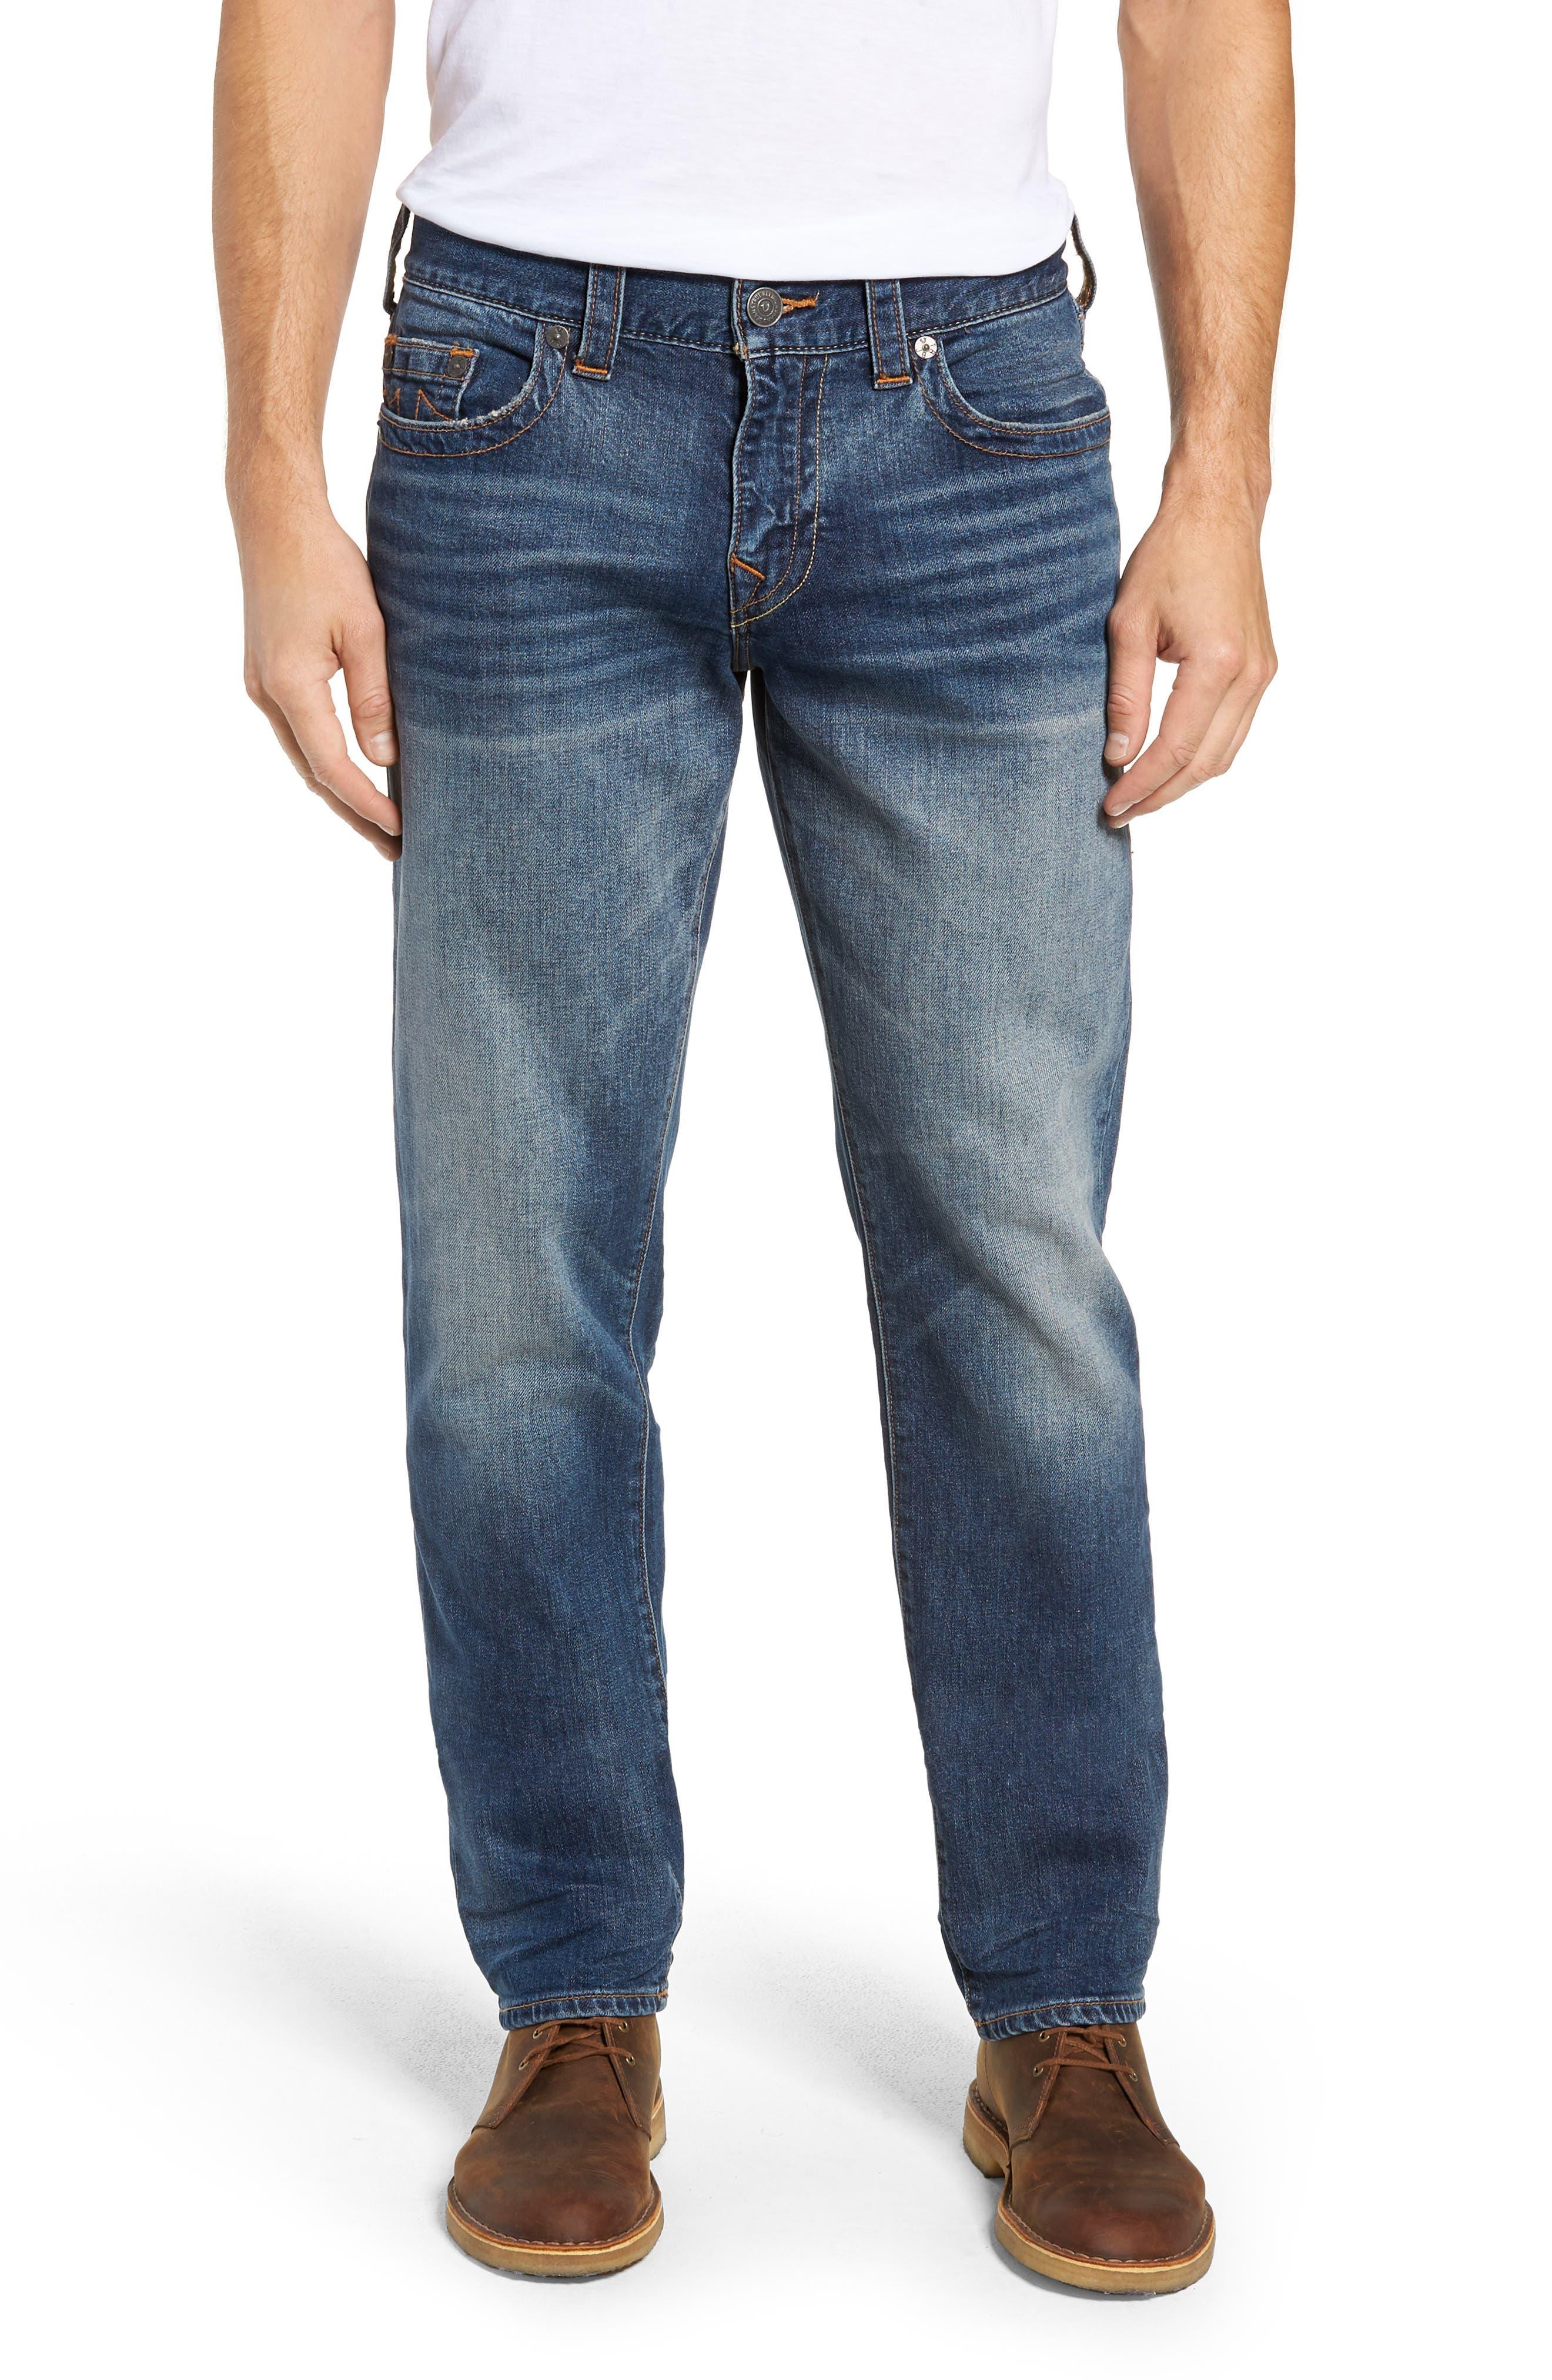 Geno Slim Straight Leg Jeans,                             Main thumbnail 1, color,                             JETSET BLUE